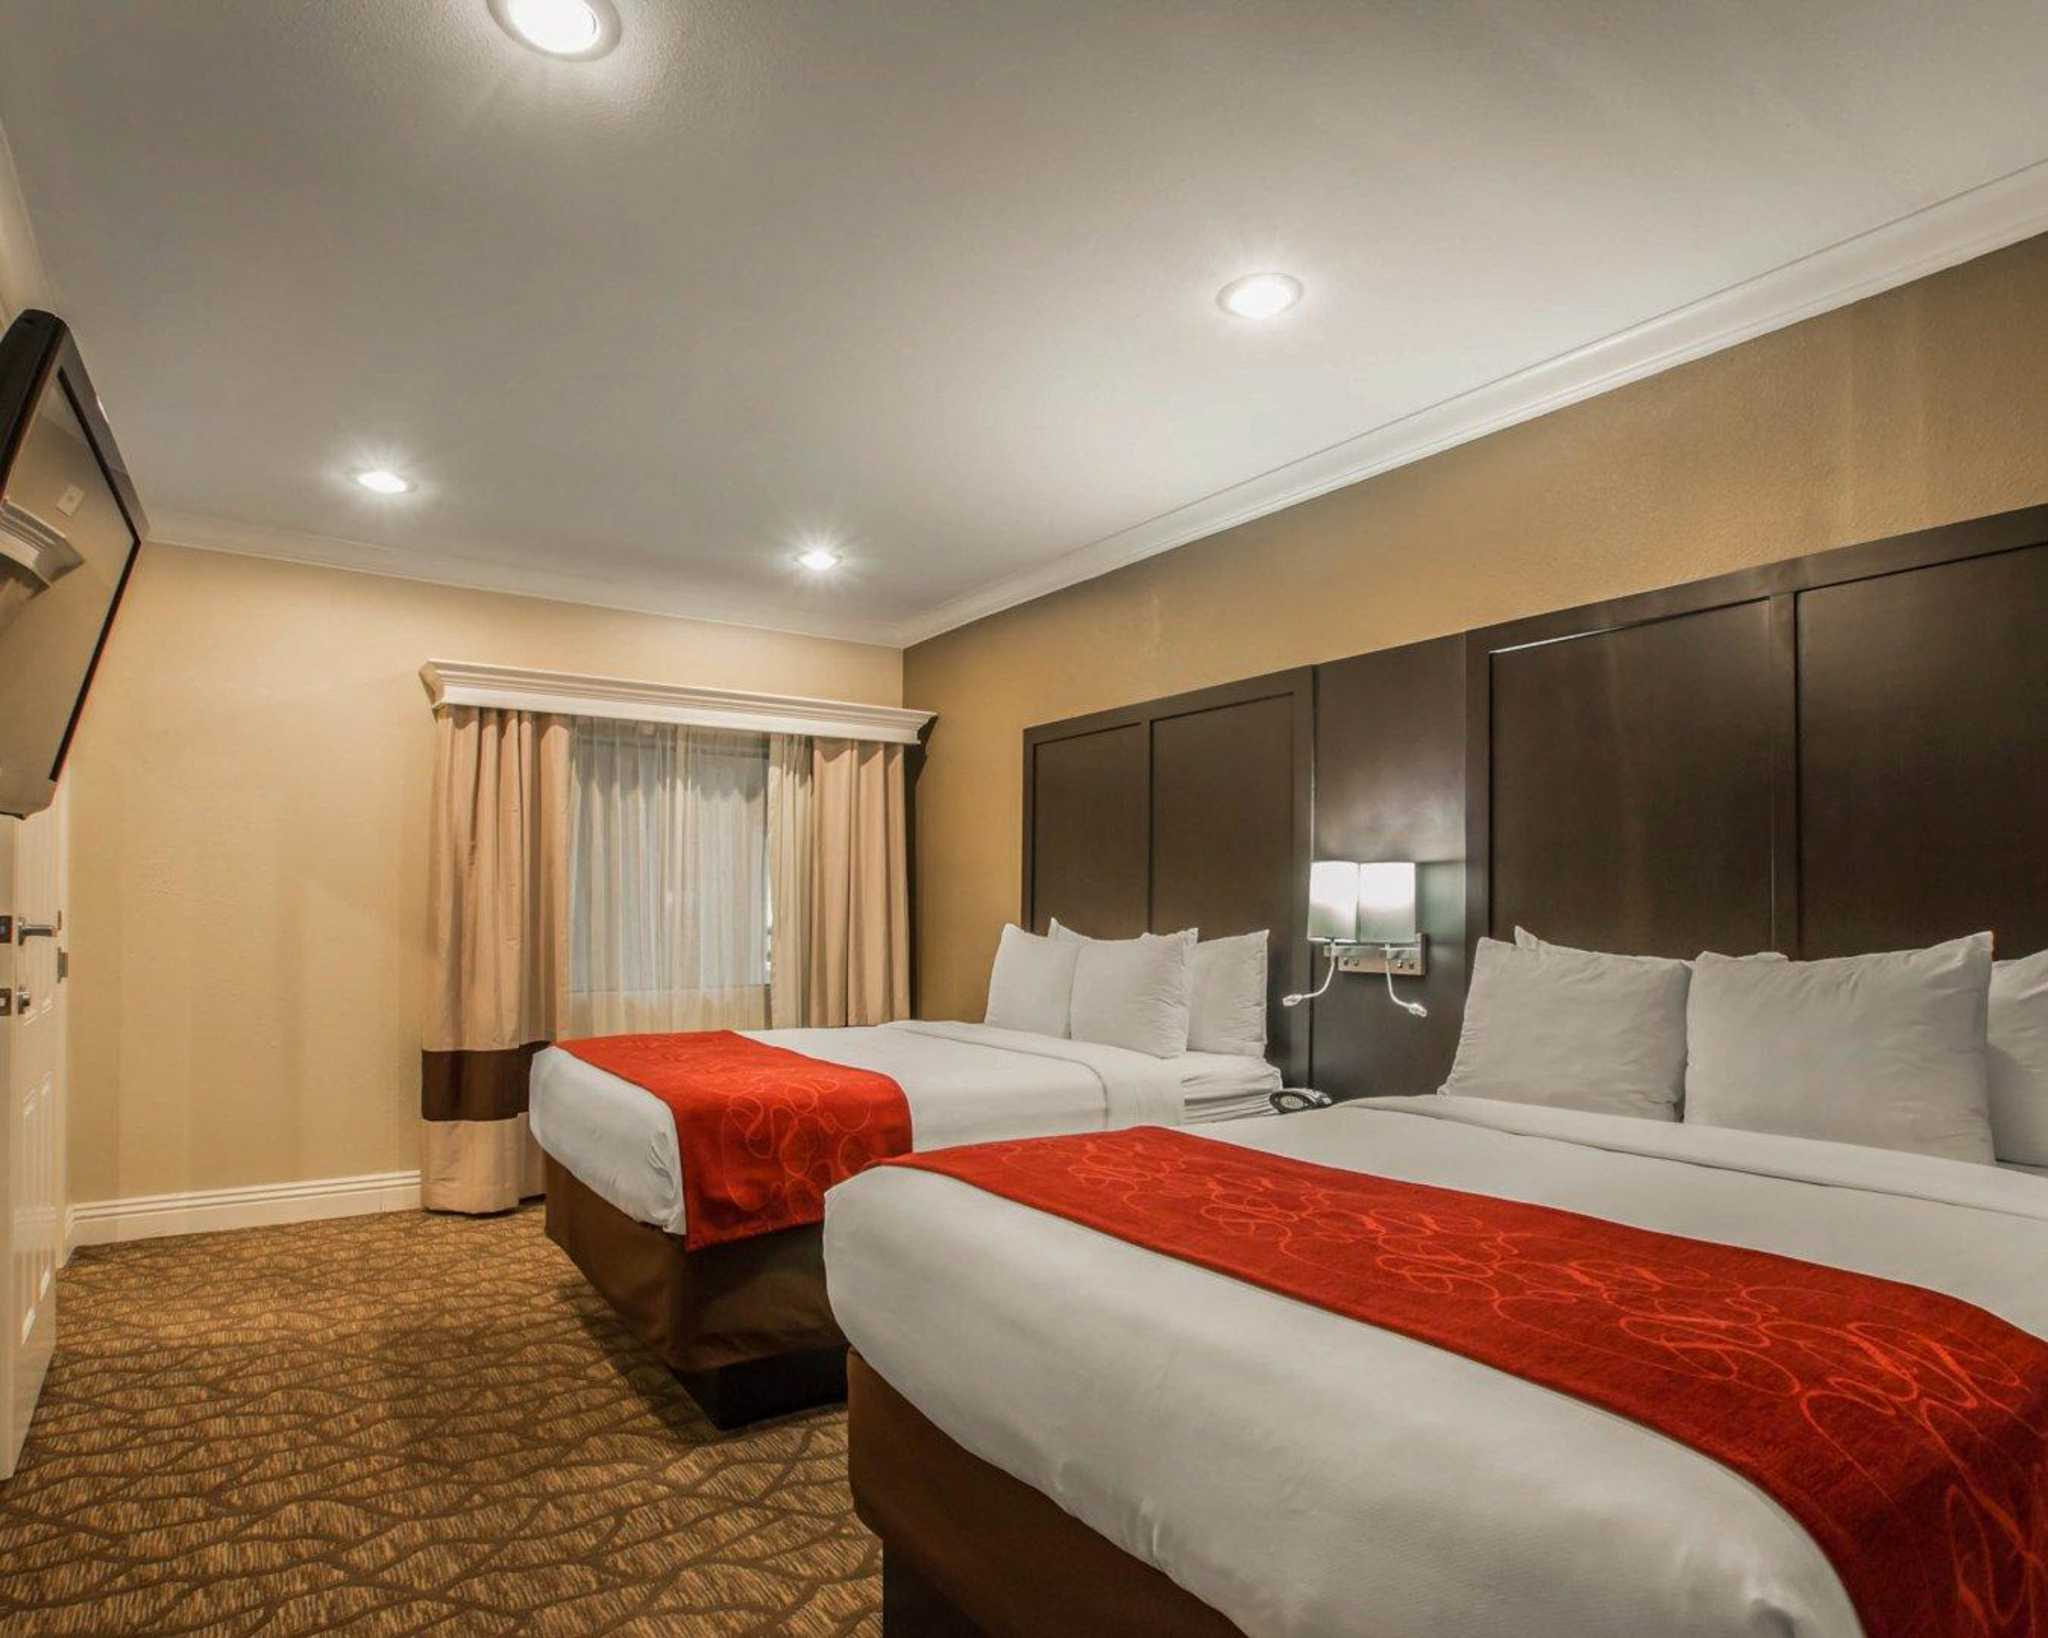 Comfort Suites Huntington Beach image 24